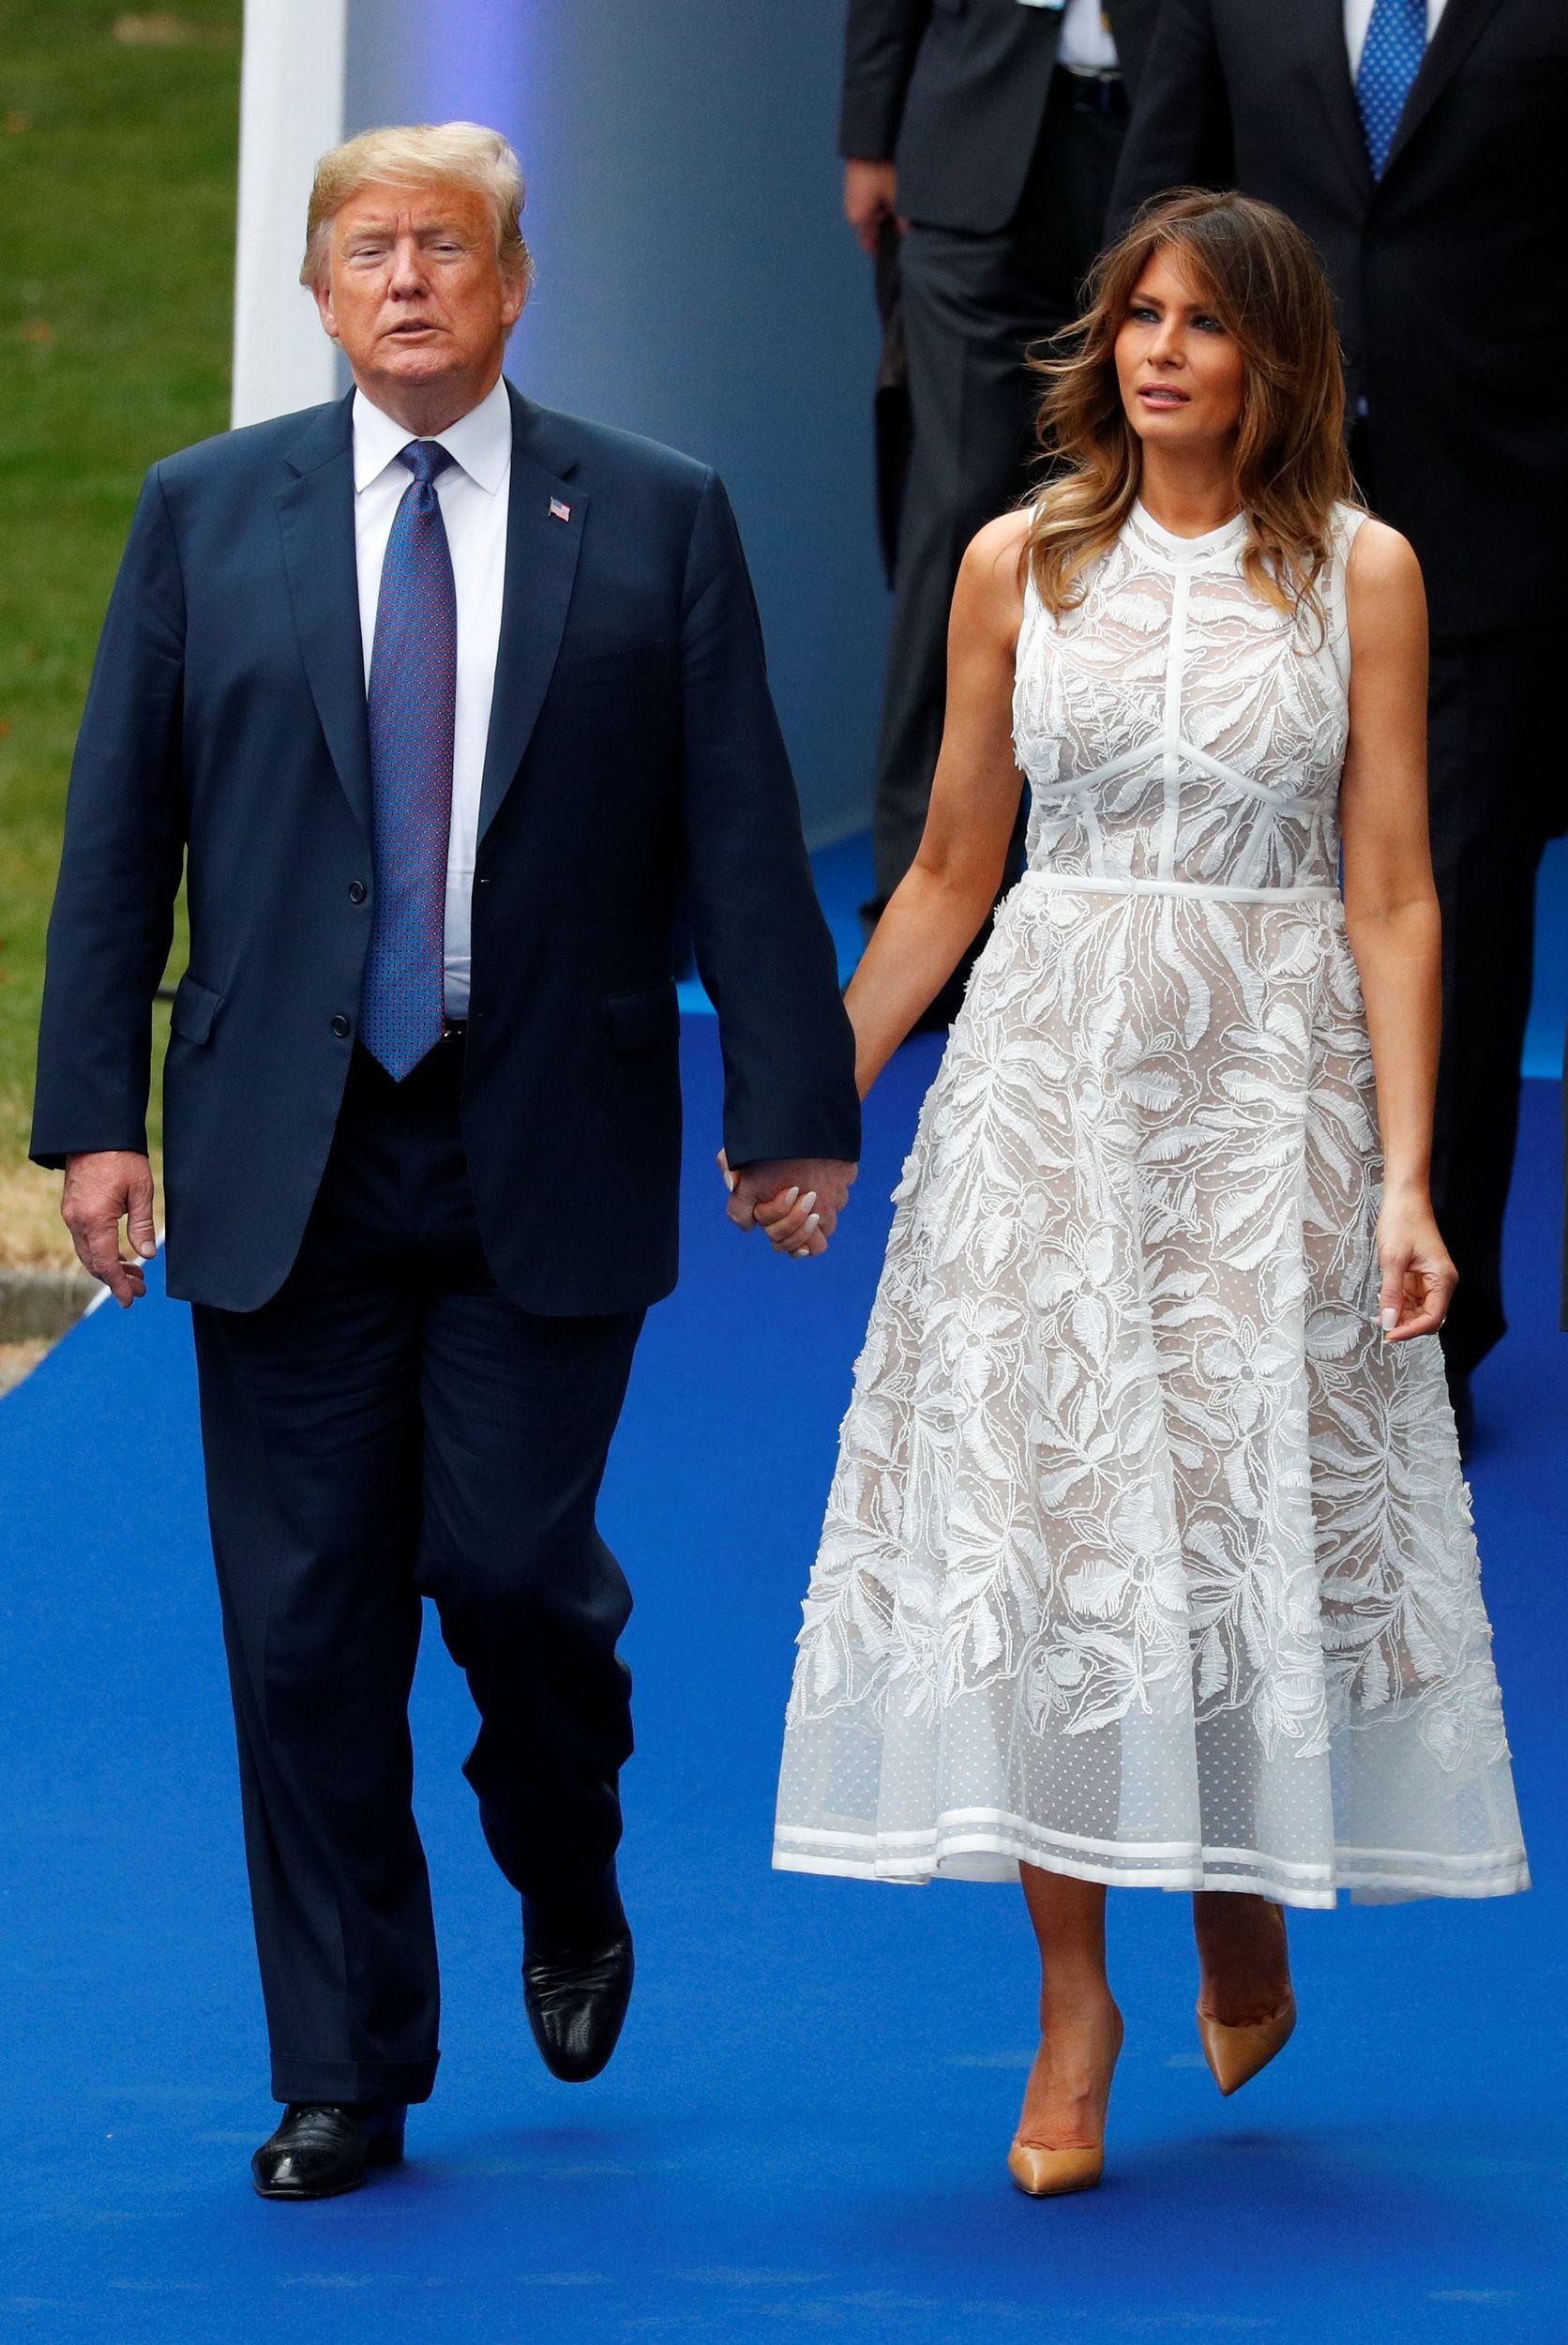 48b44cc563ac U.S. President Donald Trump walks with U.S. first lady Melania Trump in the  Park of the